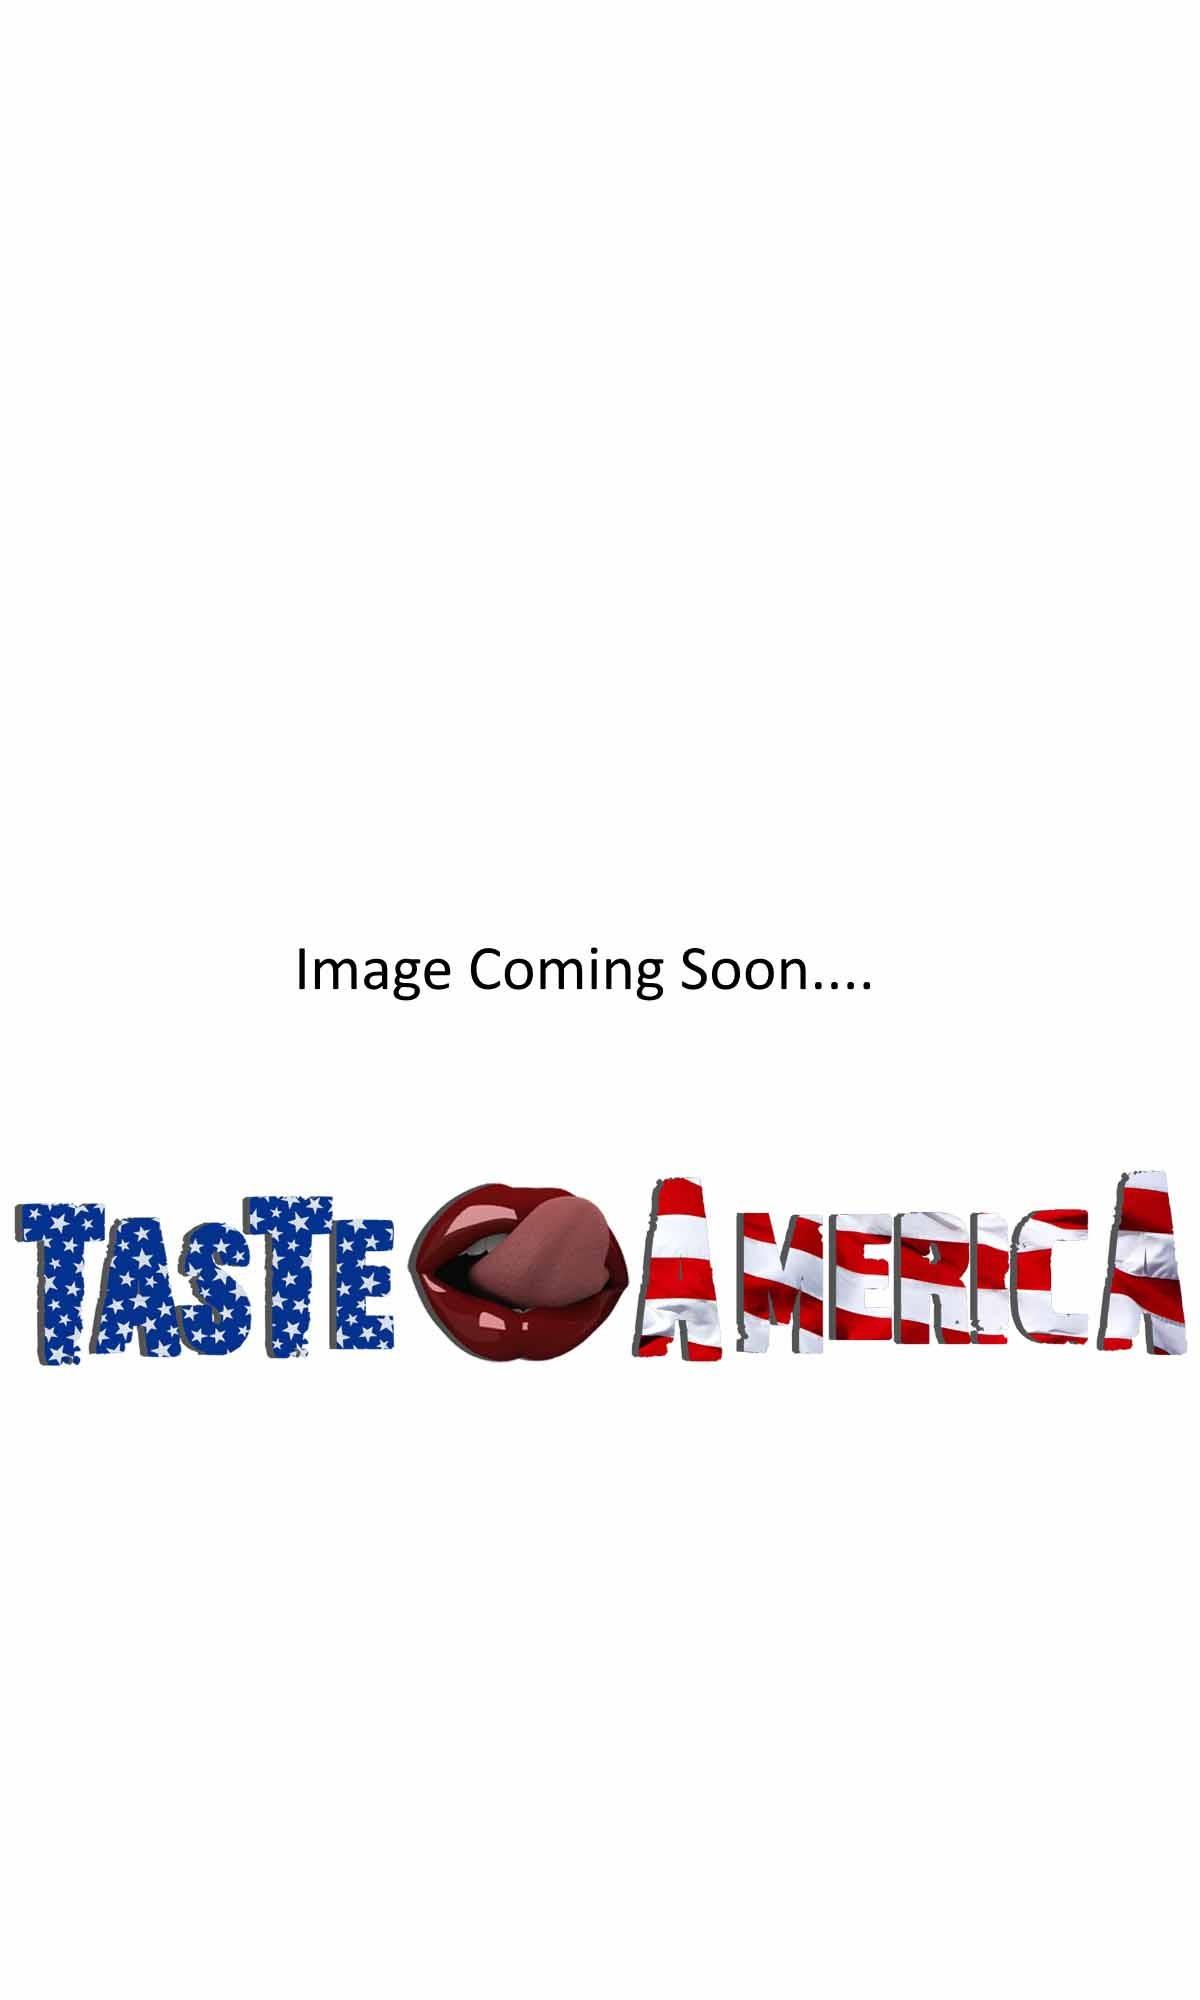 El Yucateco Hot Sauce Black Label Reserve Chile Habanero 120ml Sold By Taste America